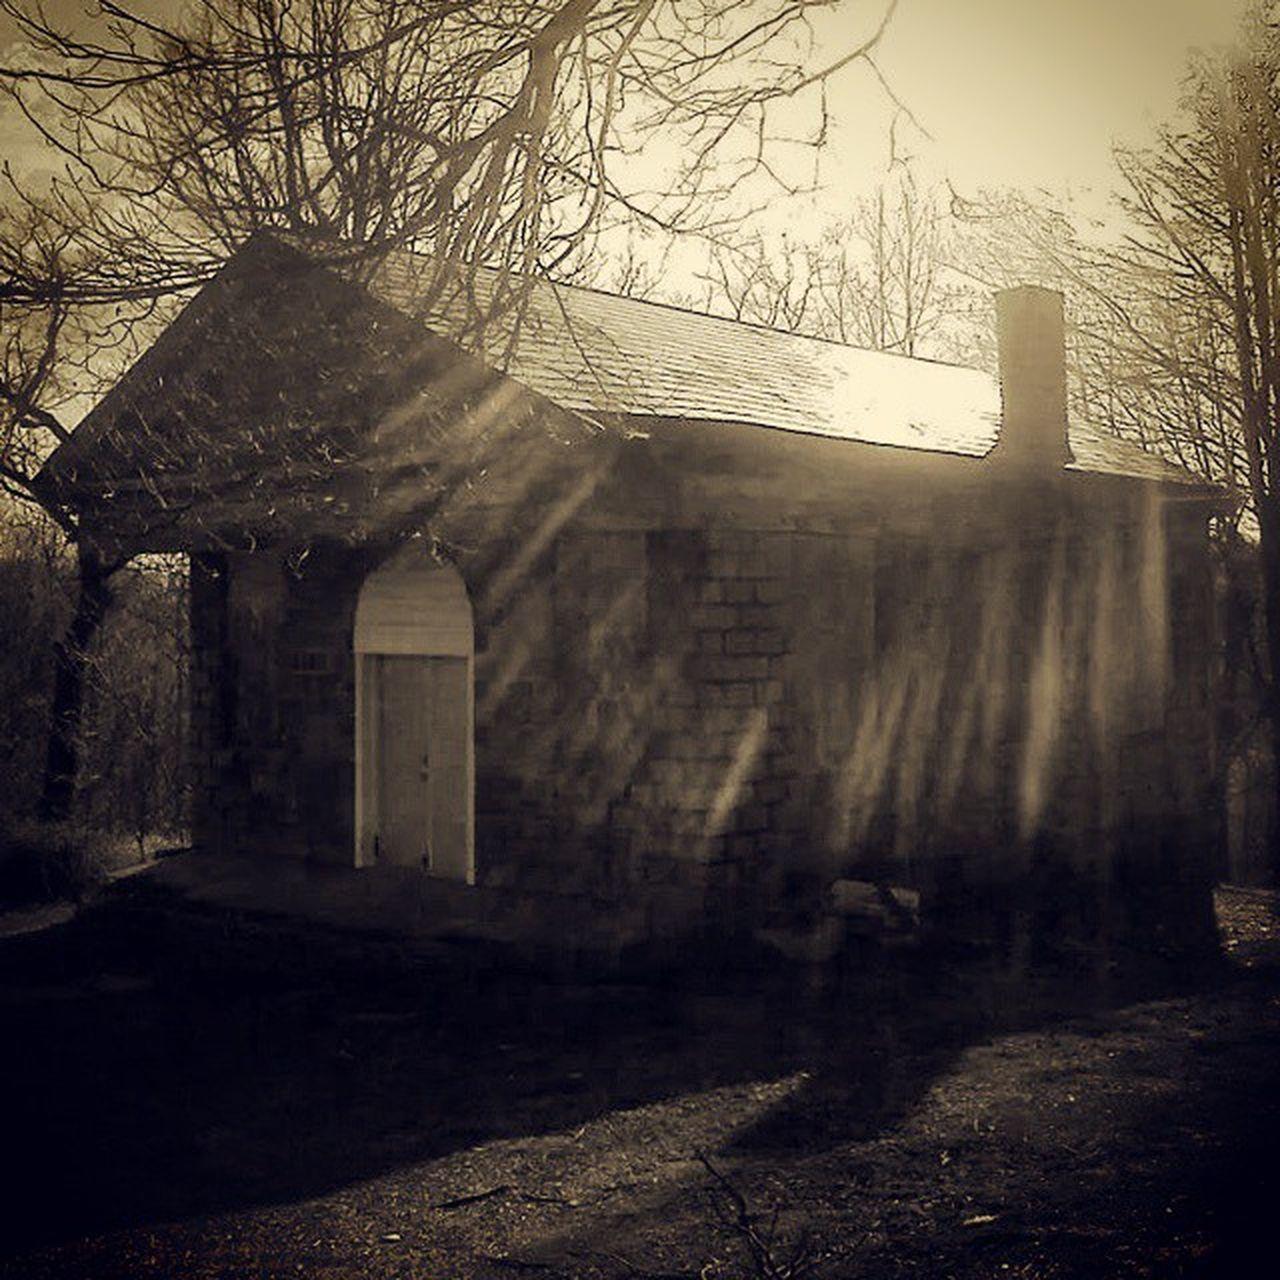 Nightofthelivingdead  Chapel EvansCity Cemetery Notld